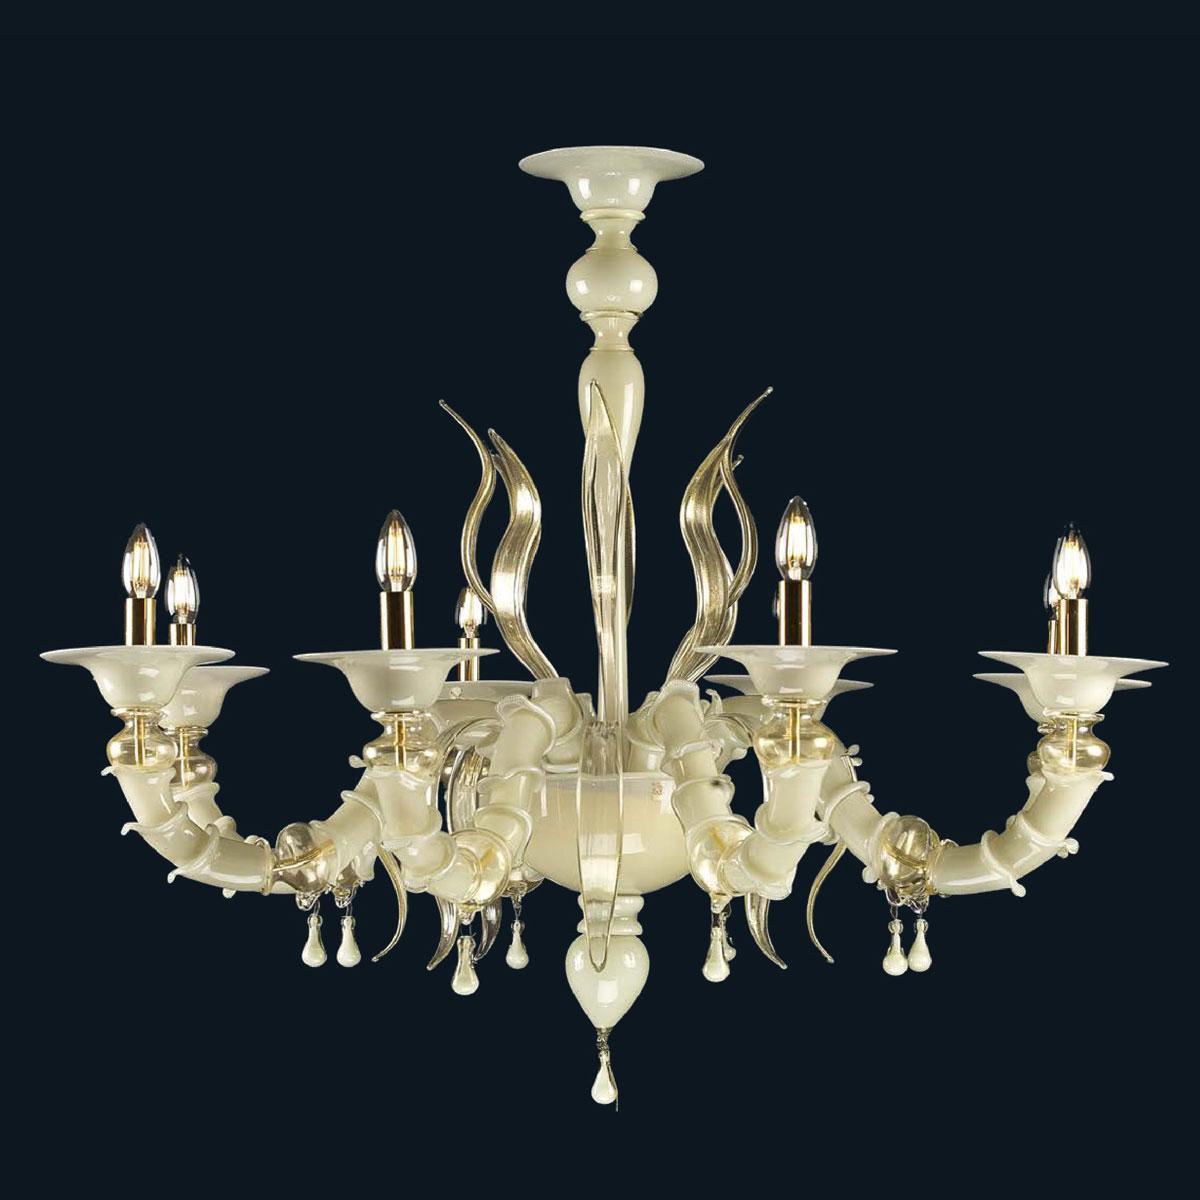 """Savanna"" lustre en cristal de Murano  - 8 lumières - blanc"